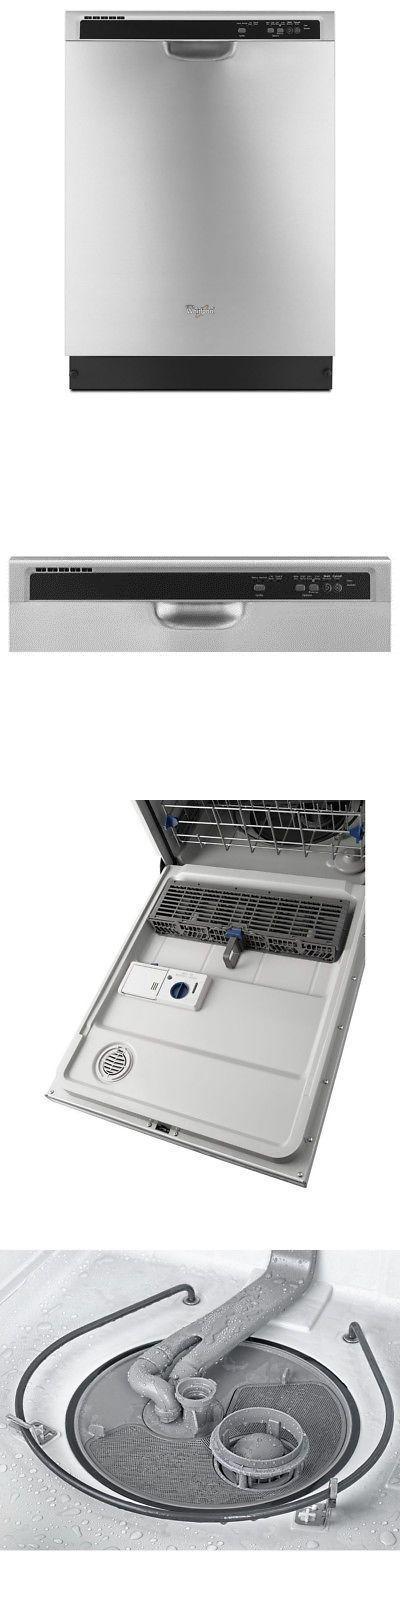 Dishwashers 116023 Whirlpool 55 Decibel Built In Dishwasher